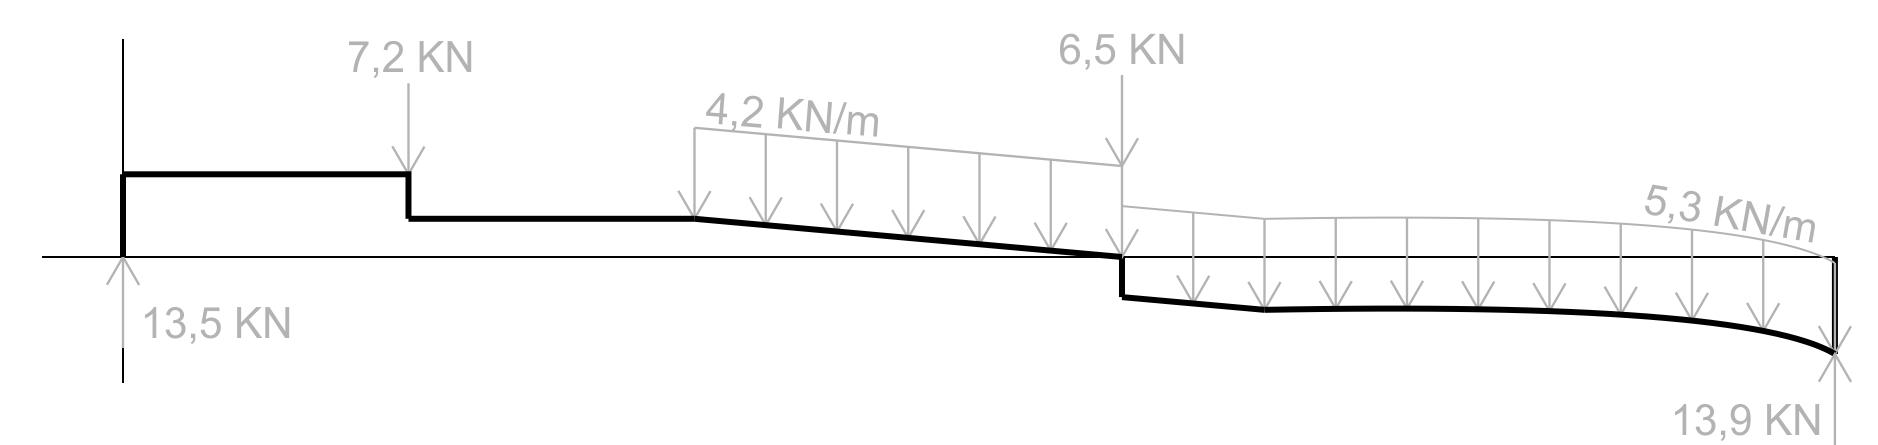 Exemplo 2.7.jpg